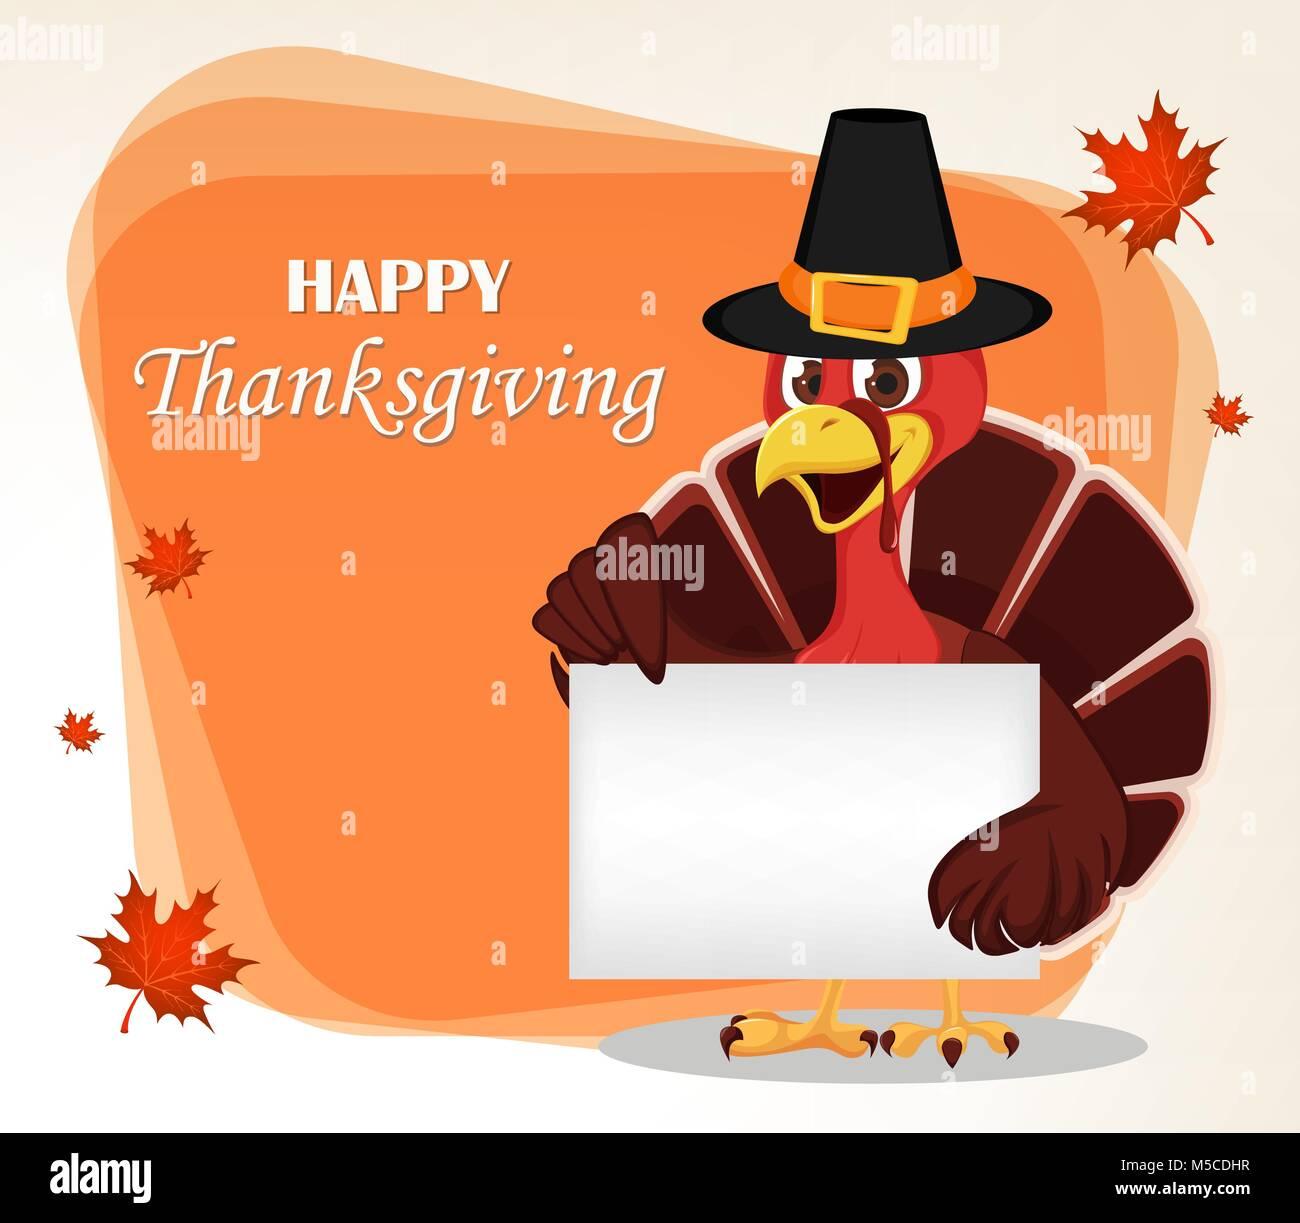 Thanksgiving Greeting Card With A Turkey Bird Wearing A Pilgrim Hat